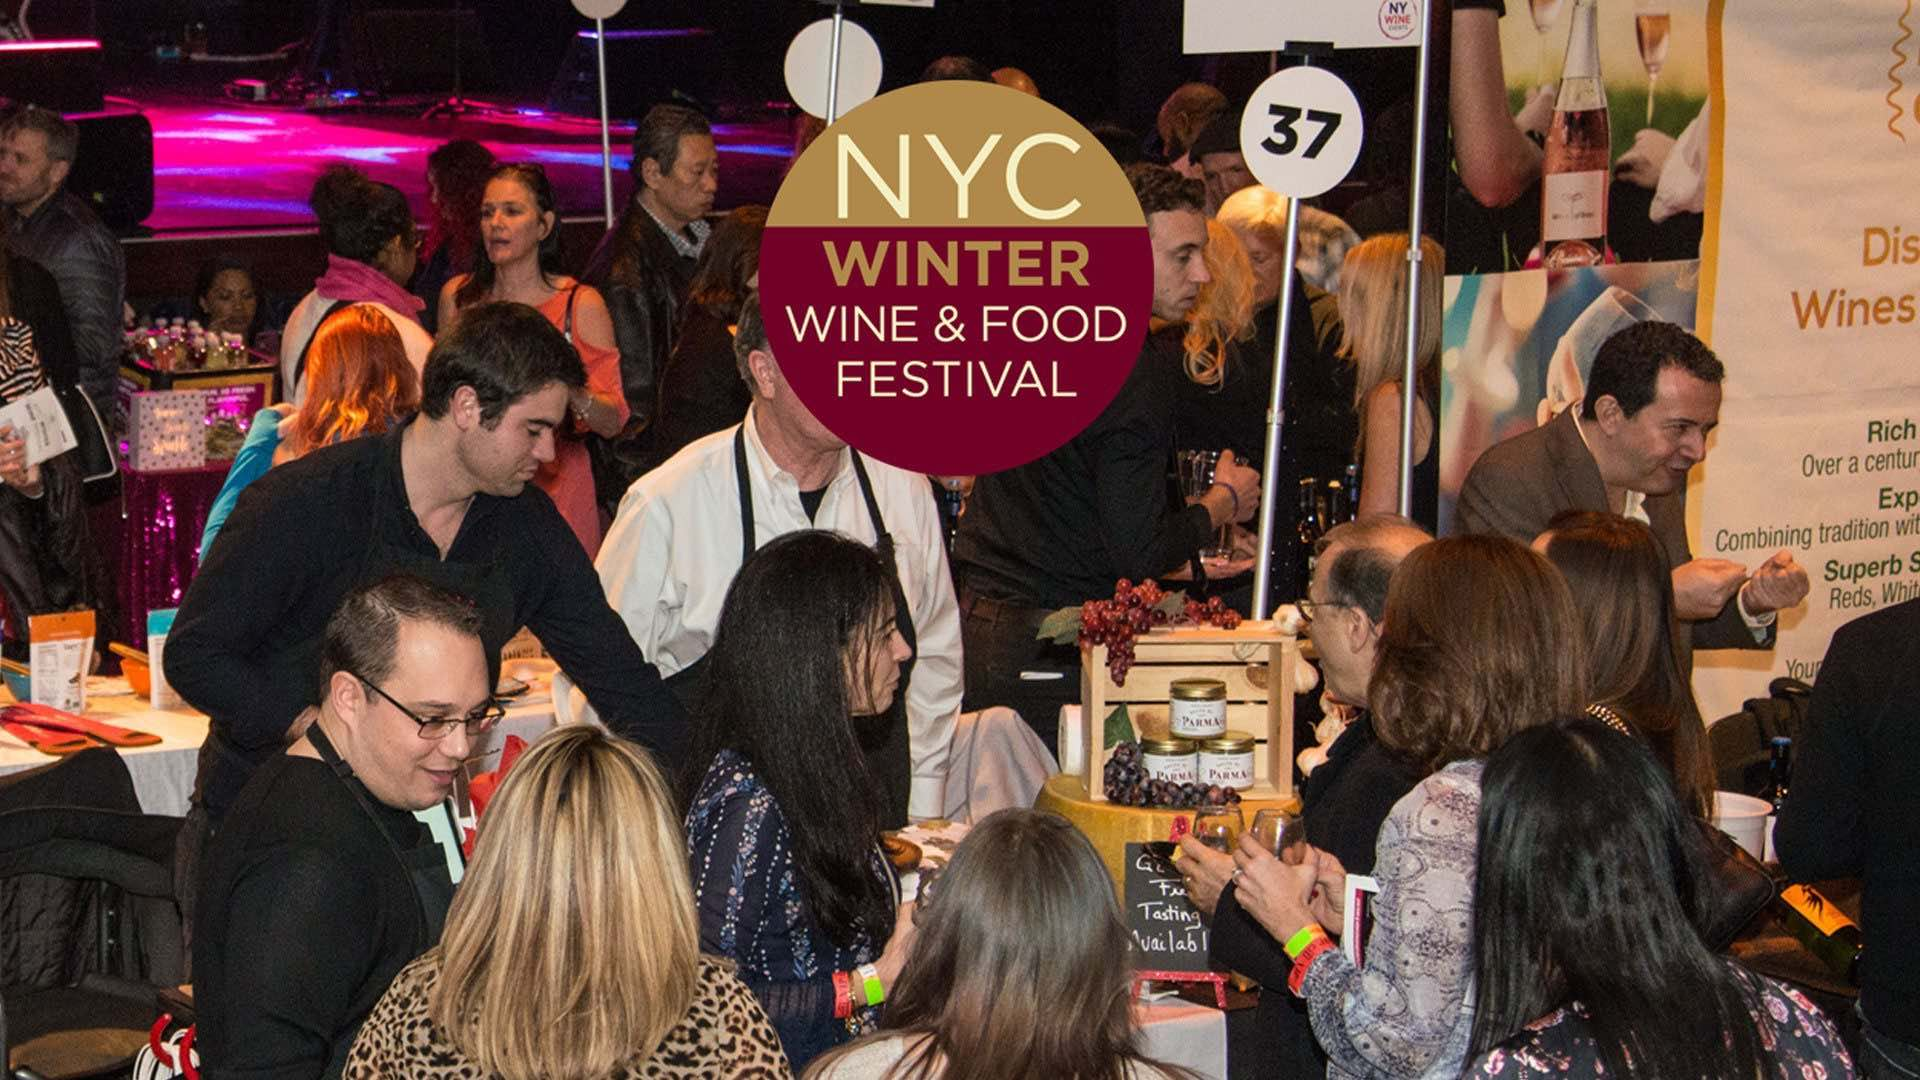 NYC Winter Wine & Food Festival